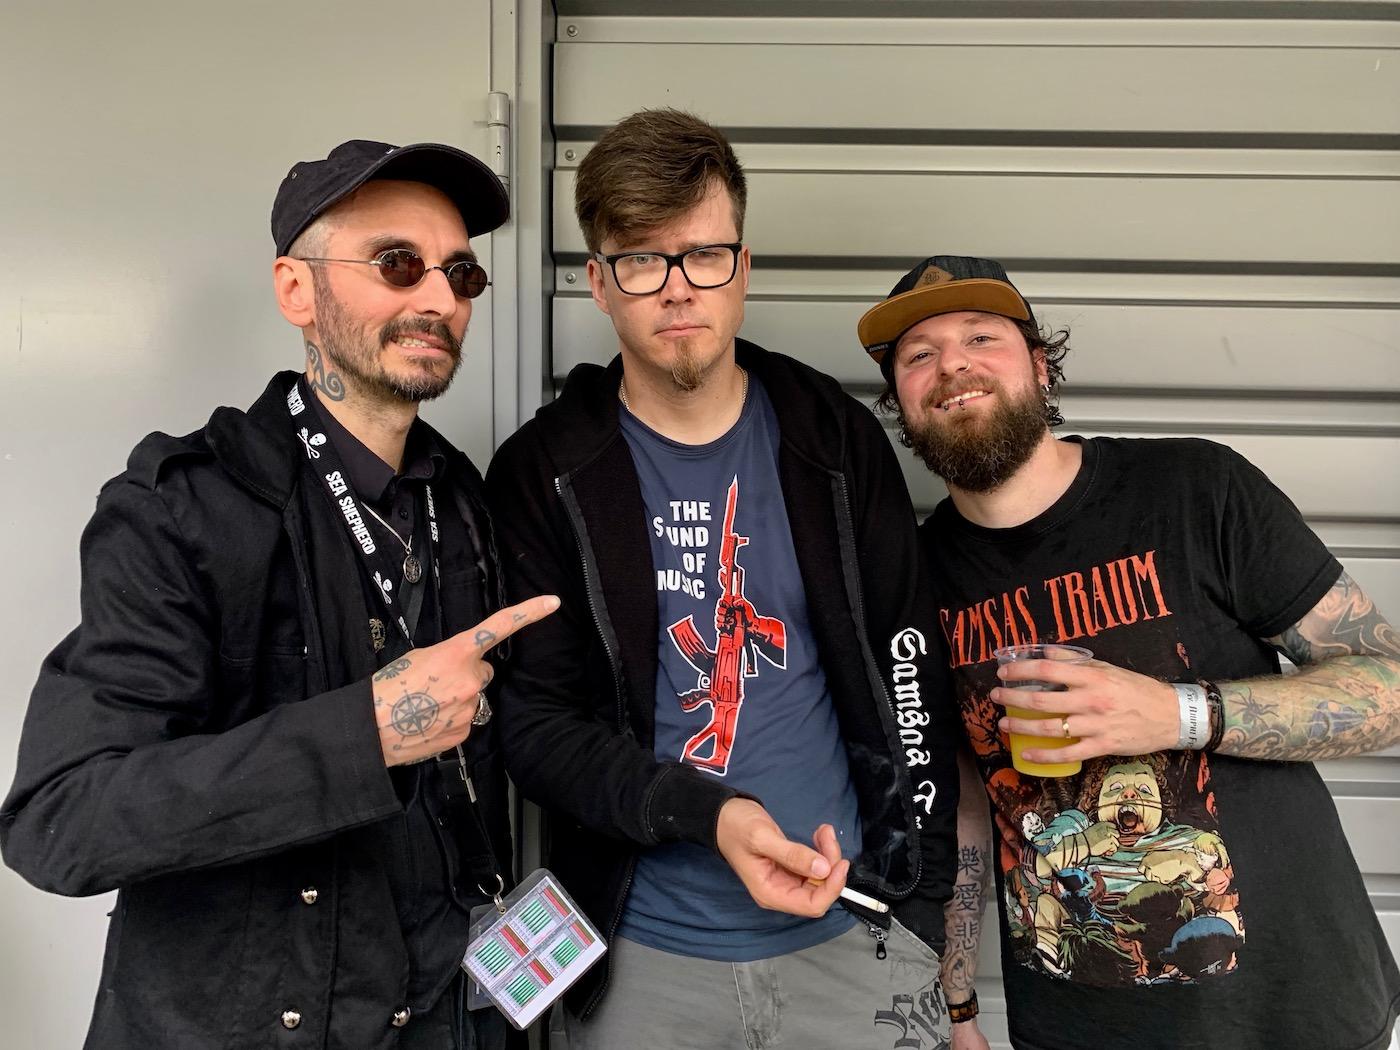 mark_benecke_amphi_festival_koeln_2019 - 40.jpg